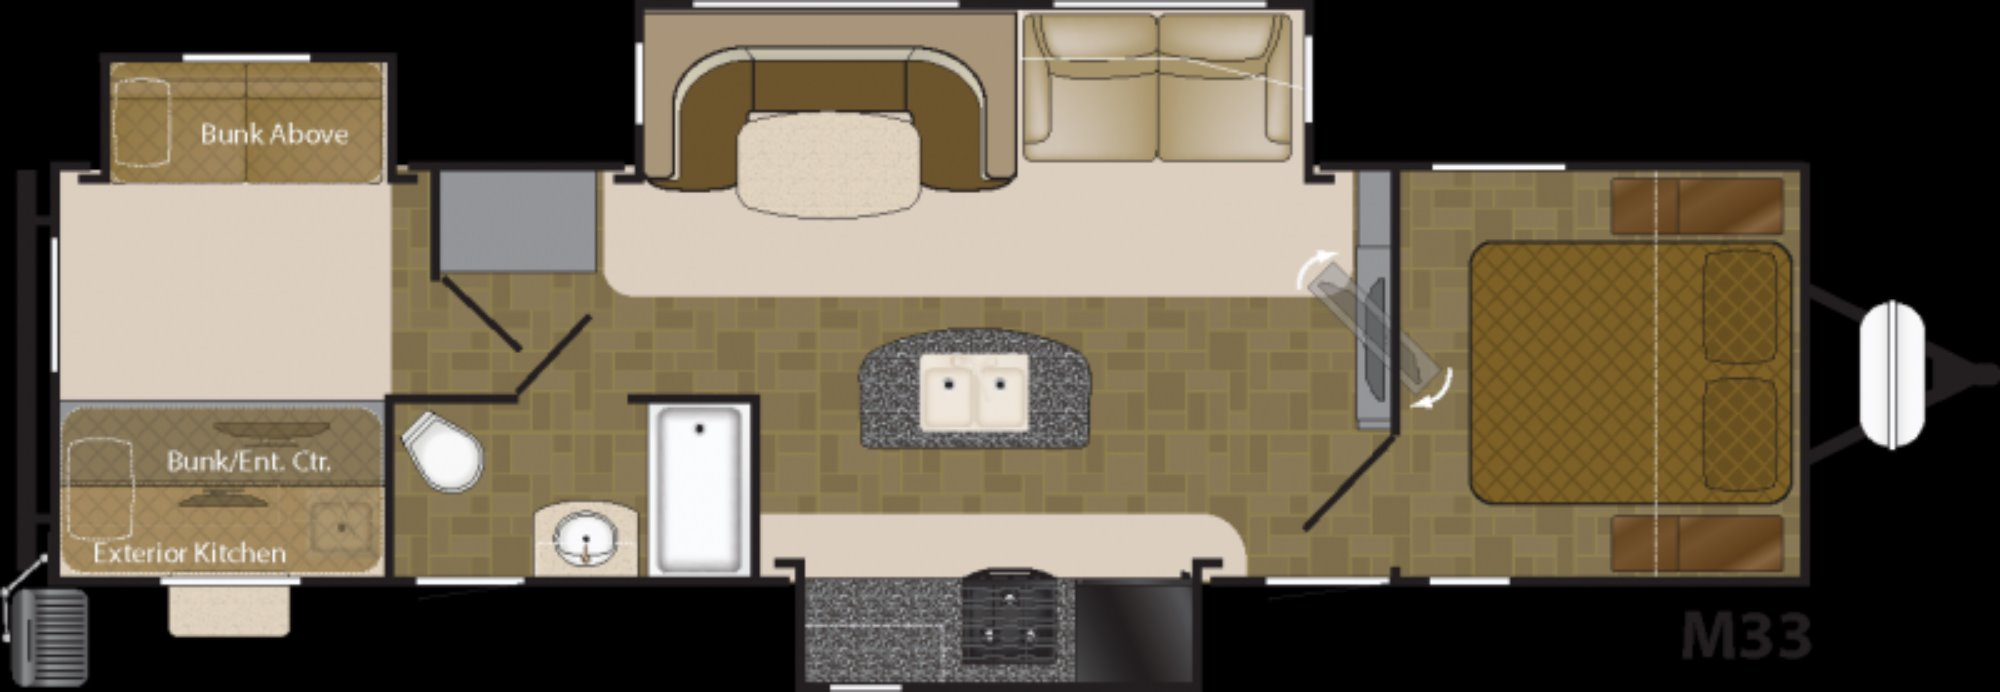 24j camper wiring diagram